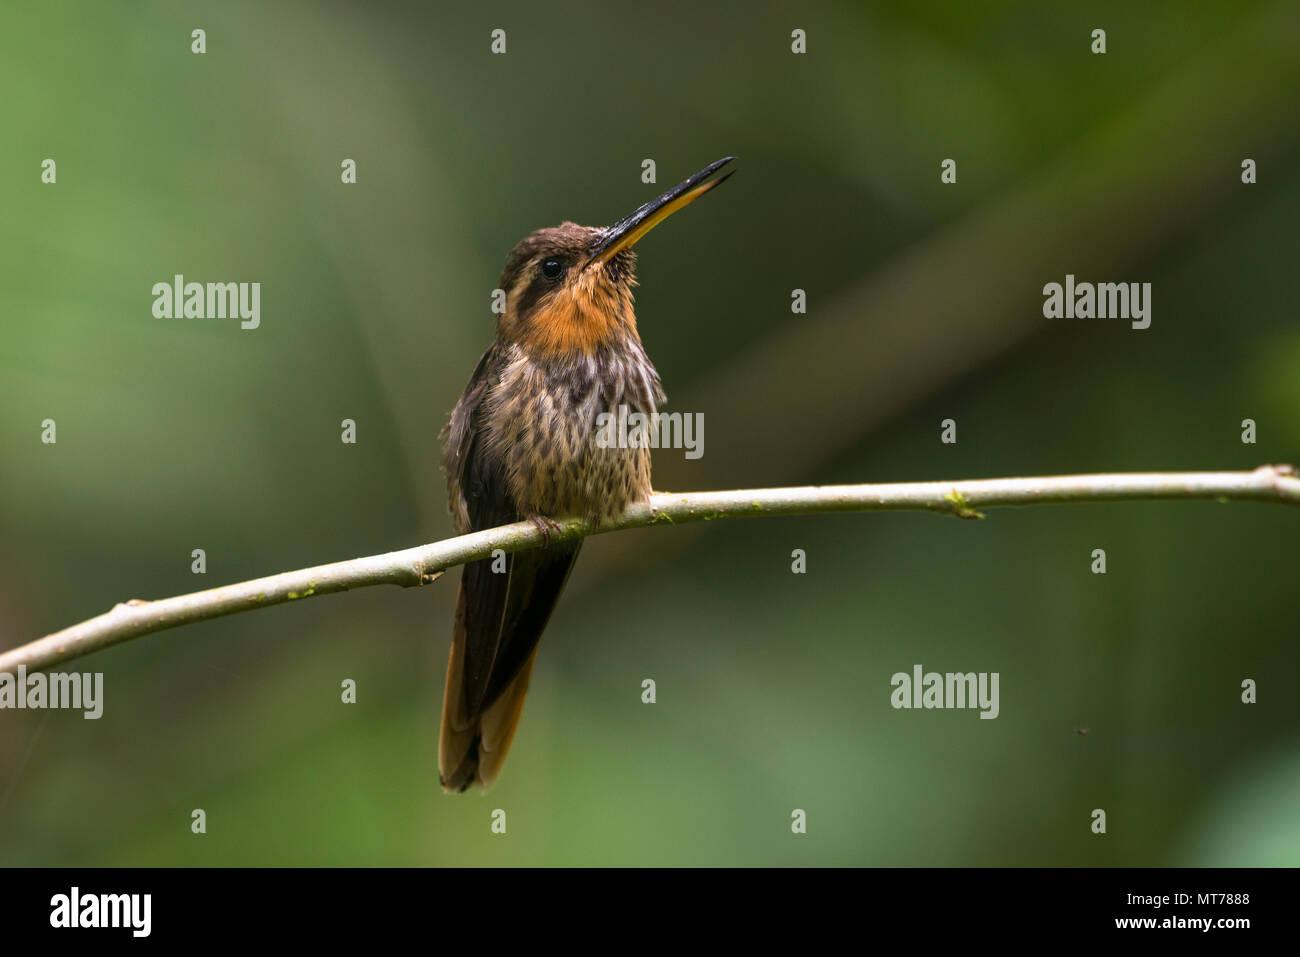 Saw-billed Hermit (Ramphodon naevius) from the Atlantic Rainforest - Stock Image